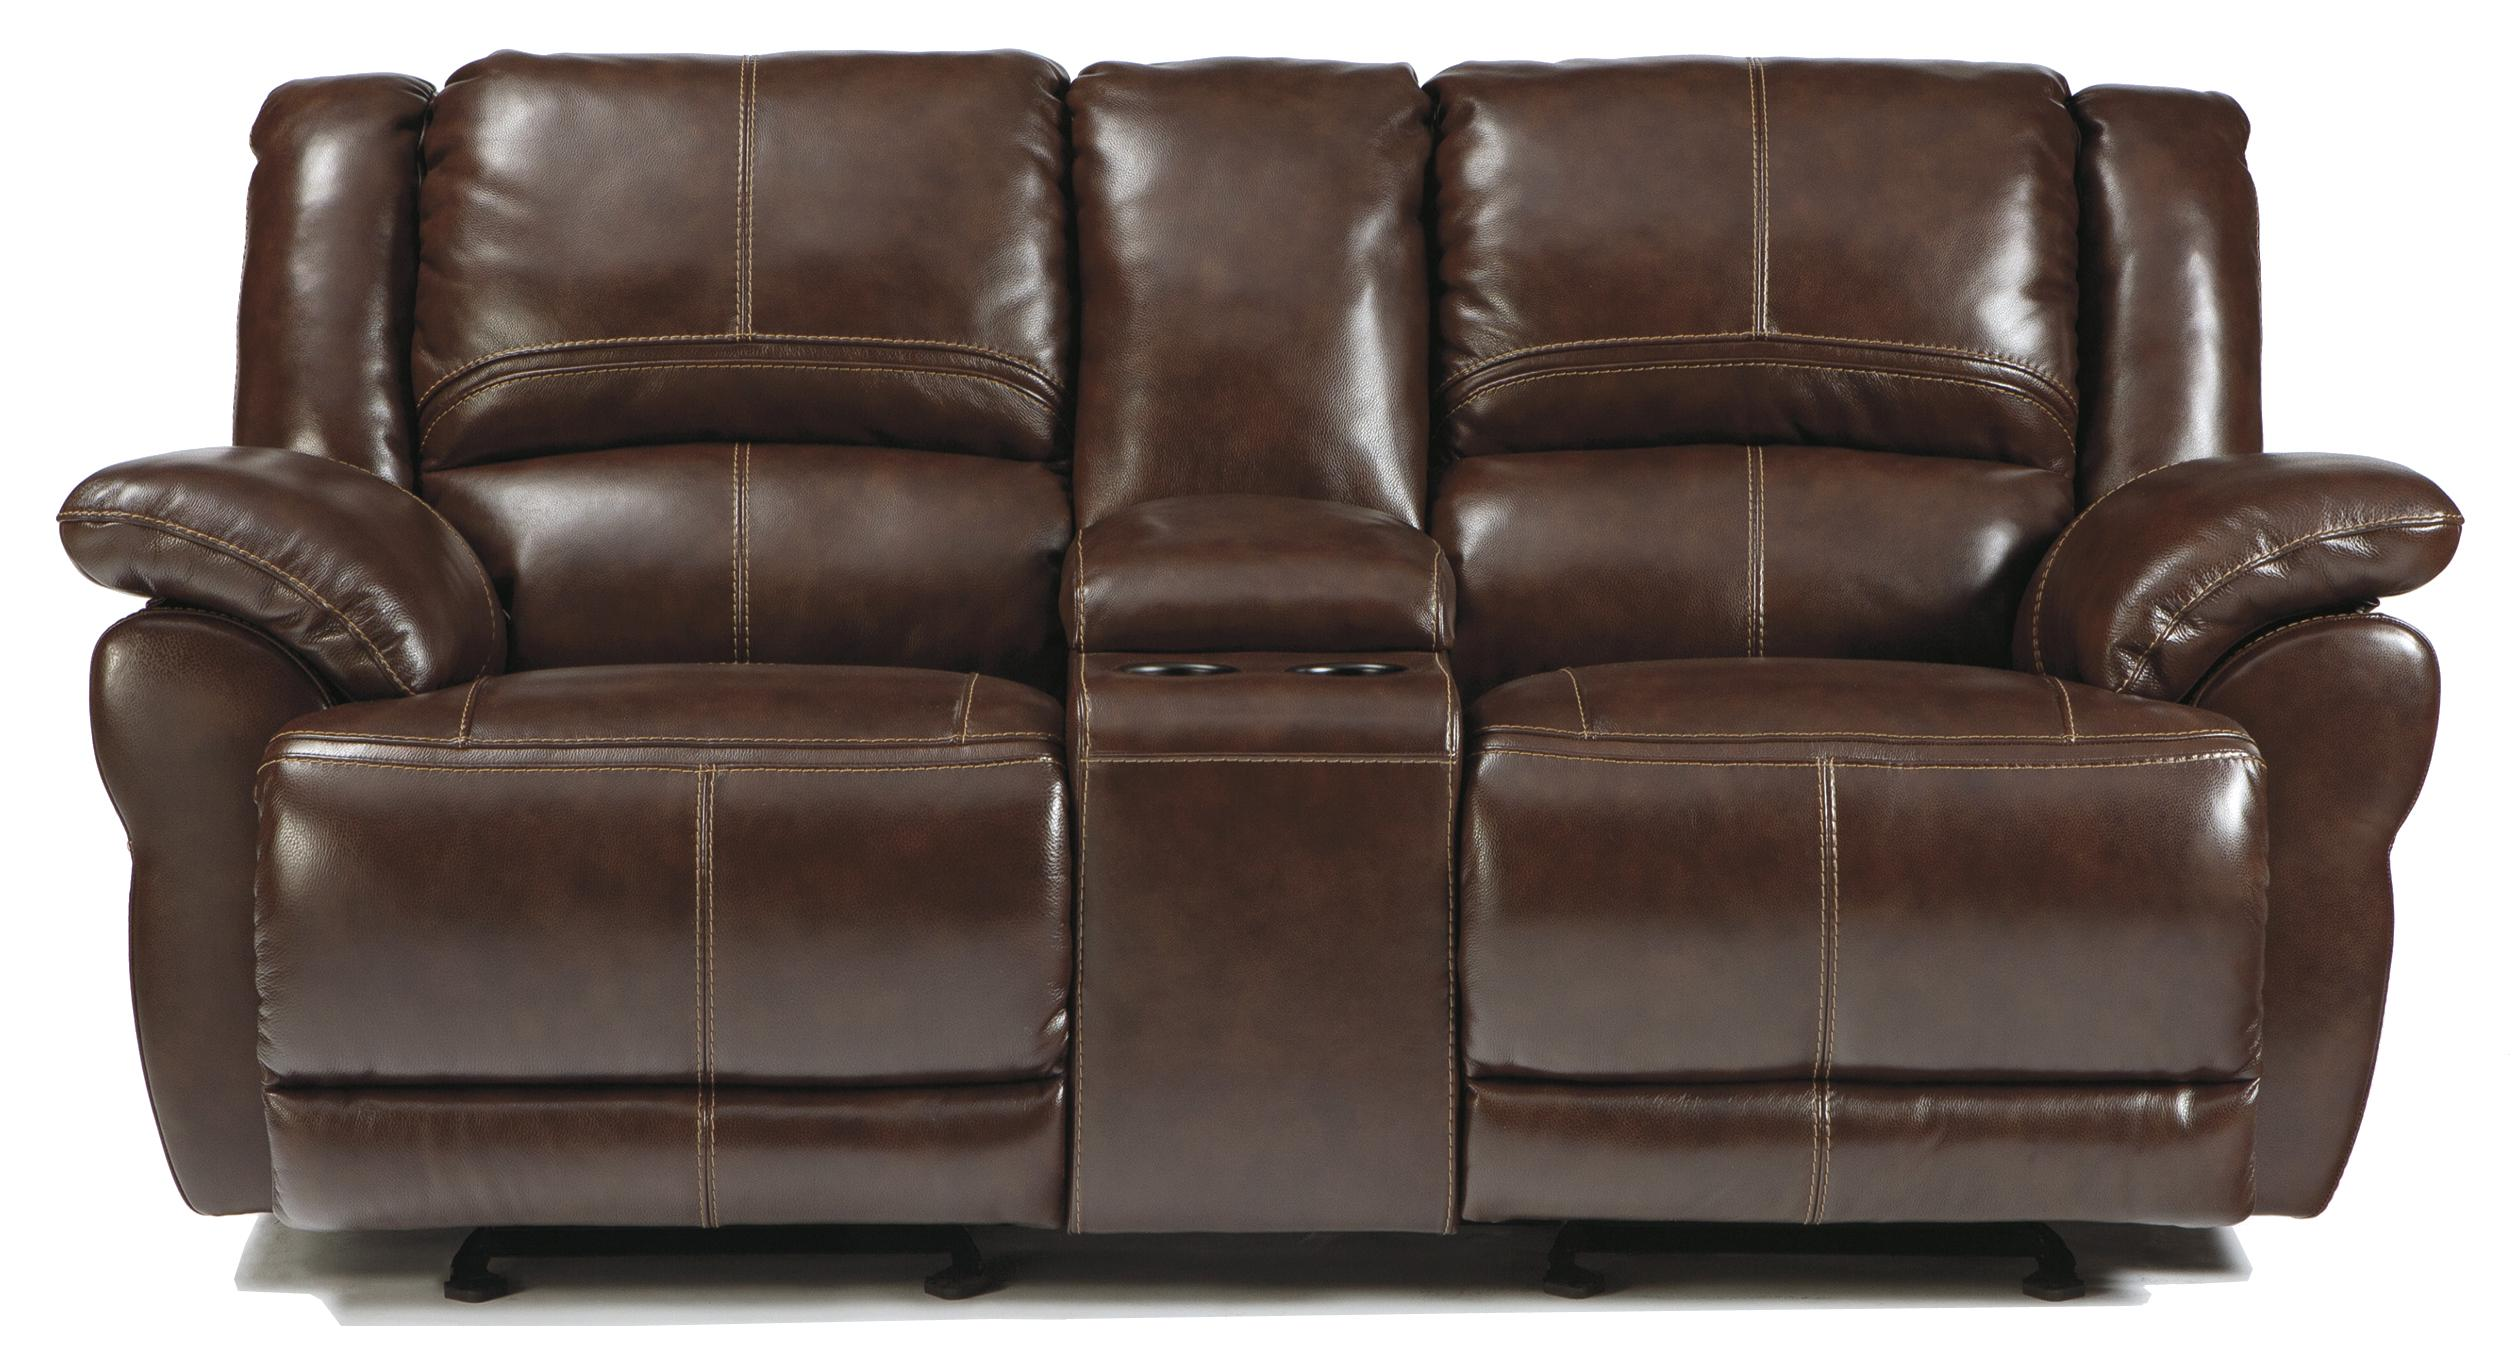 Signature Design By Ashley Furniture Lenoris Coffee Leather Match Glider Reclining Power